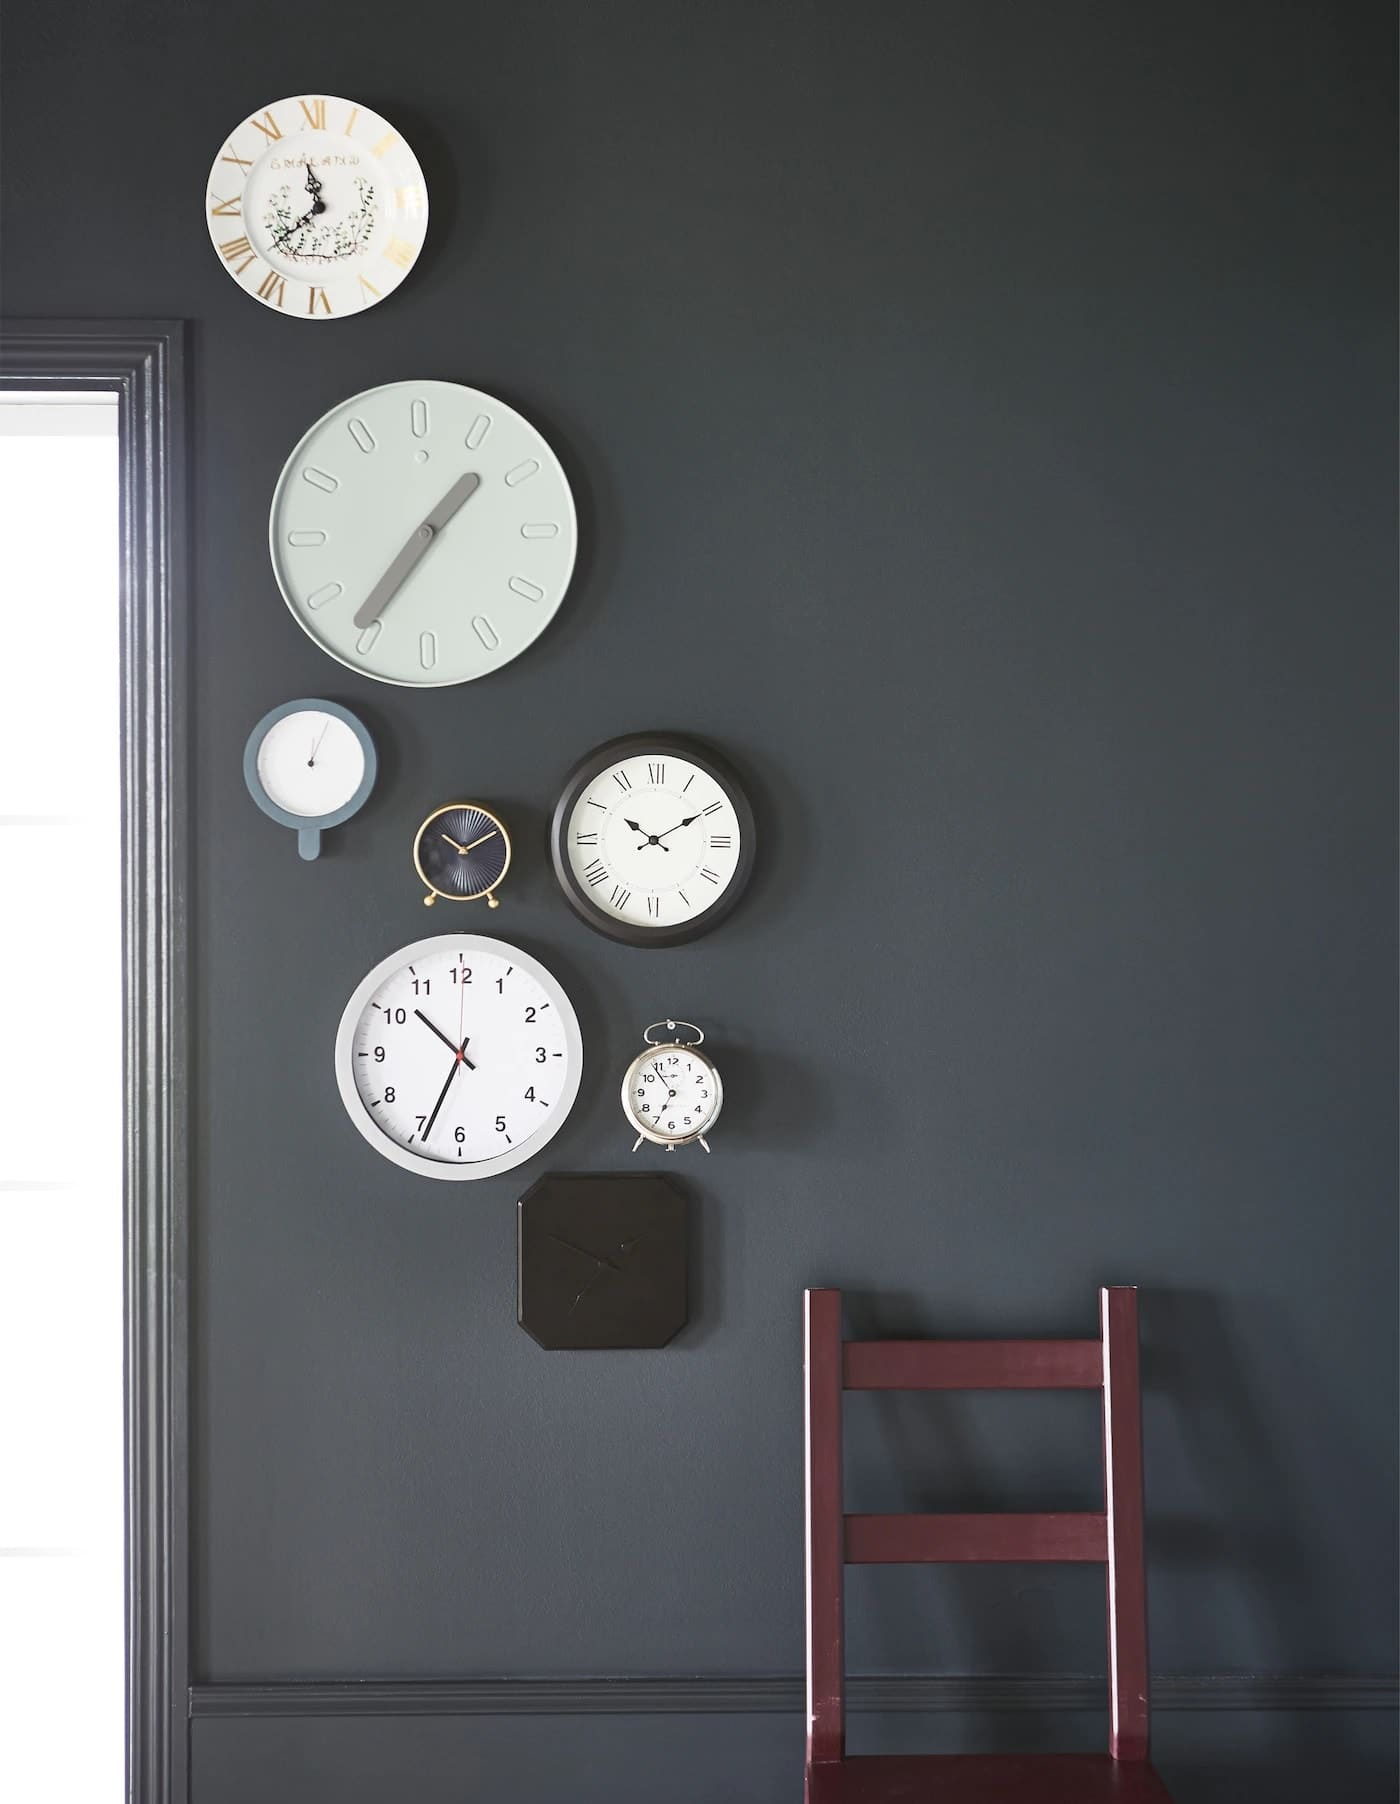 ikea duvar aksesuarlari ile dekorasyon fikirleri (26)-min-min